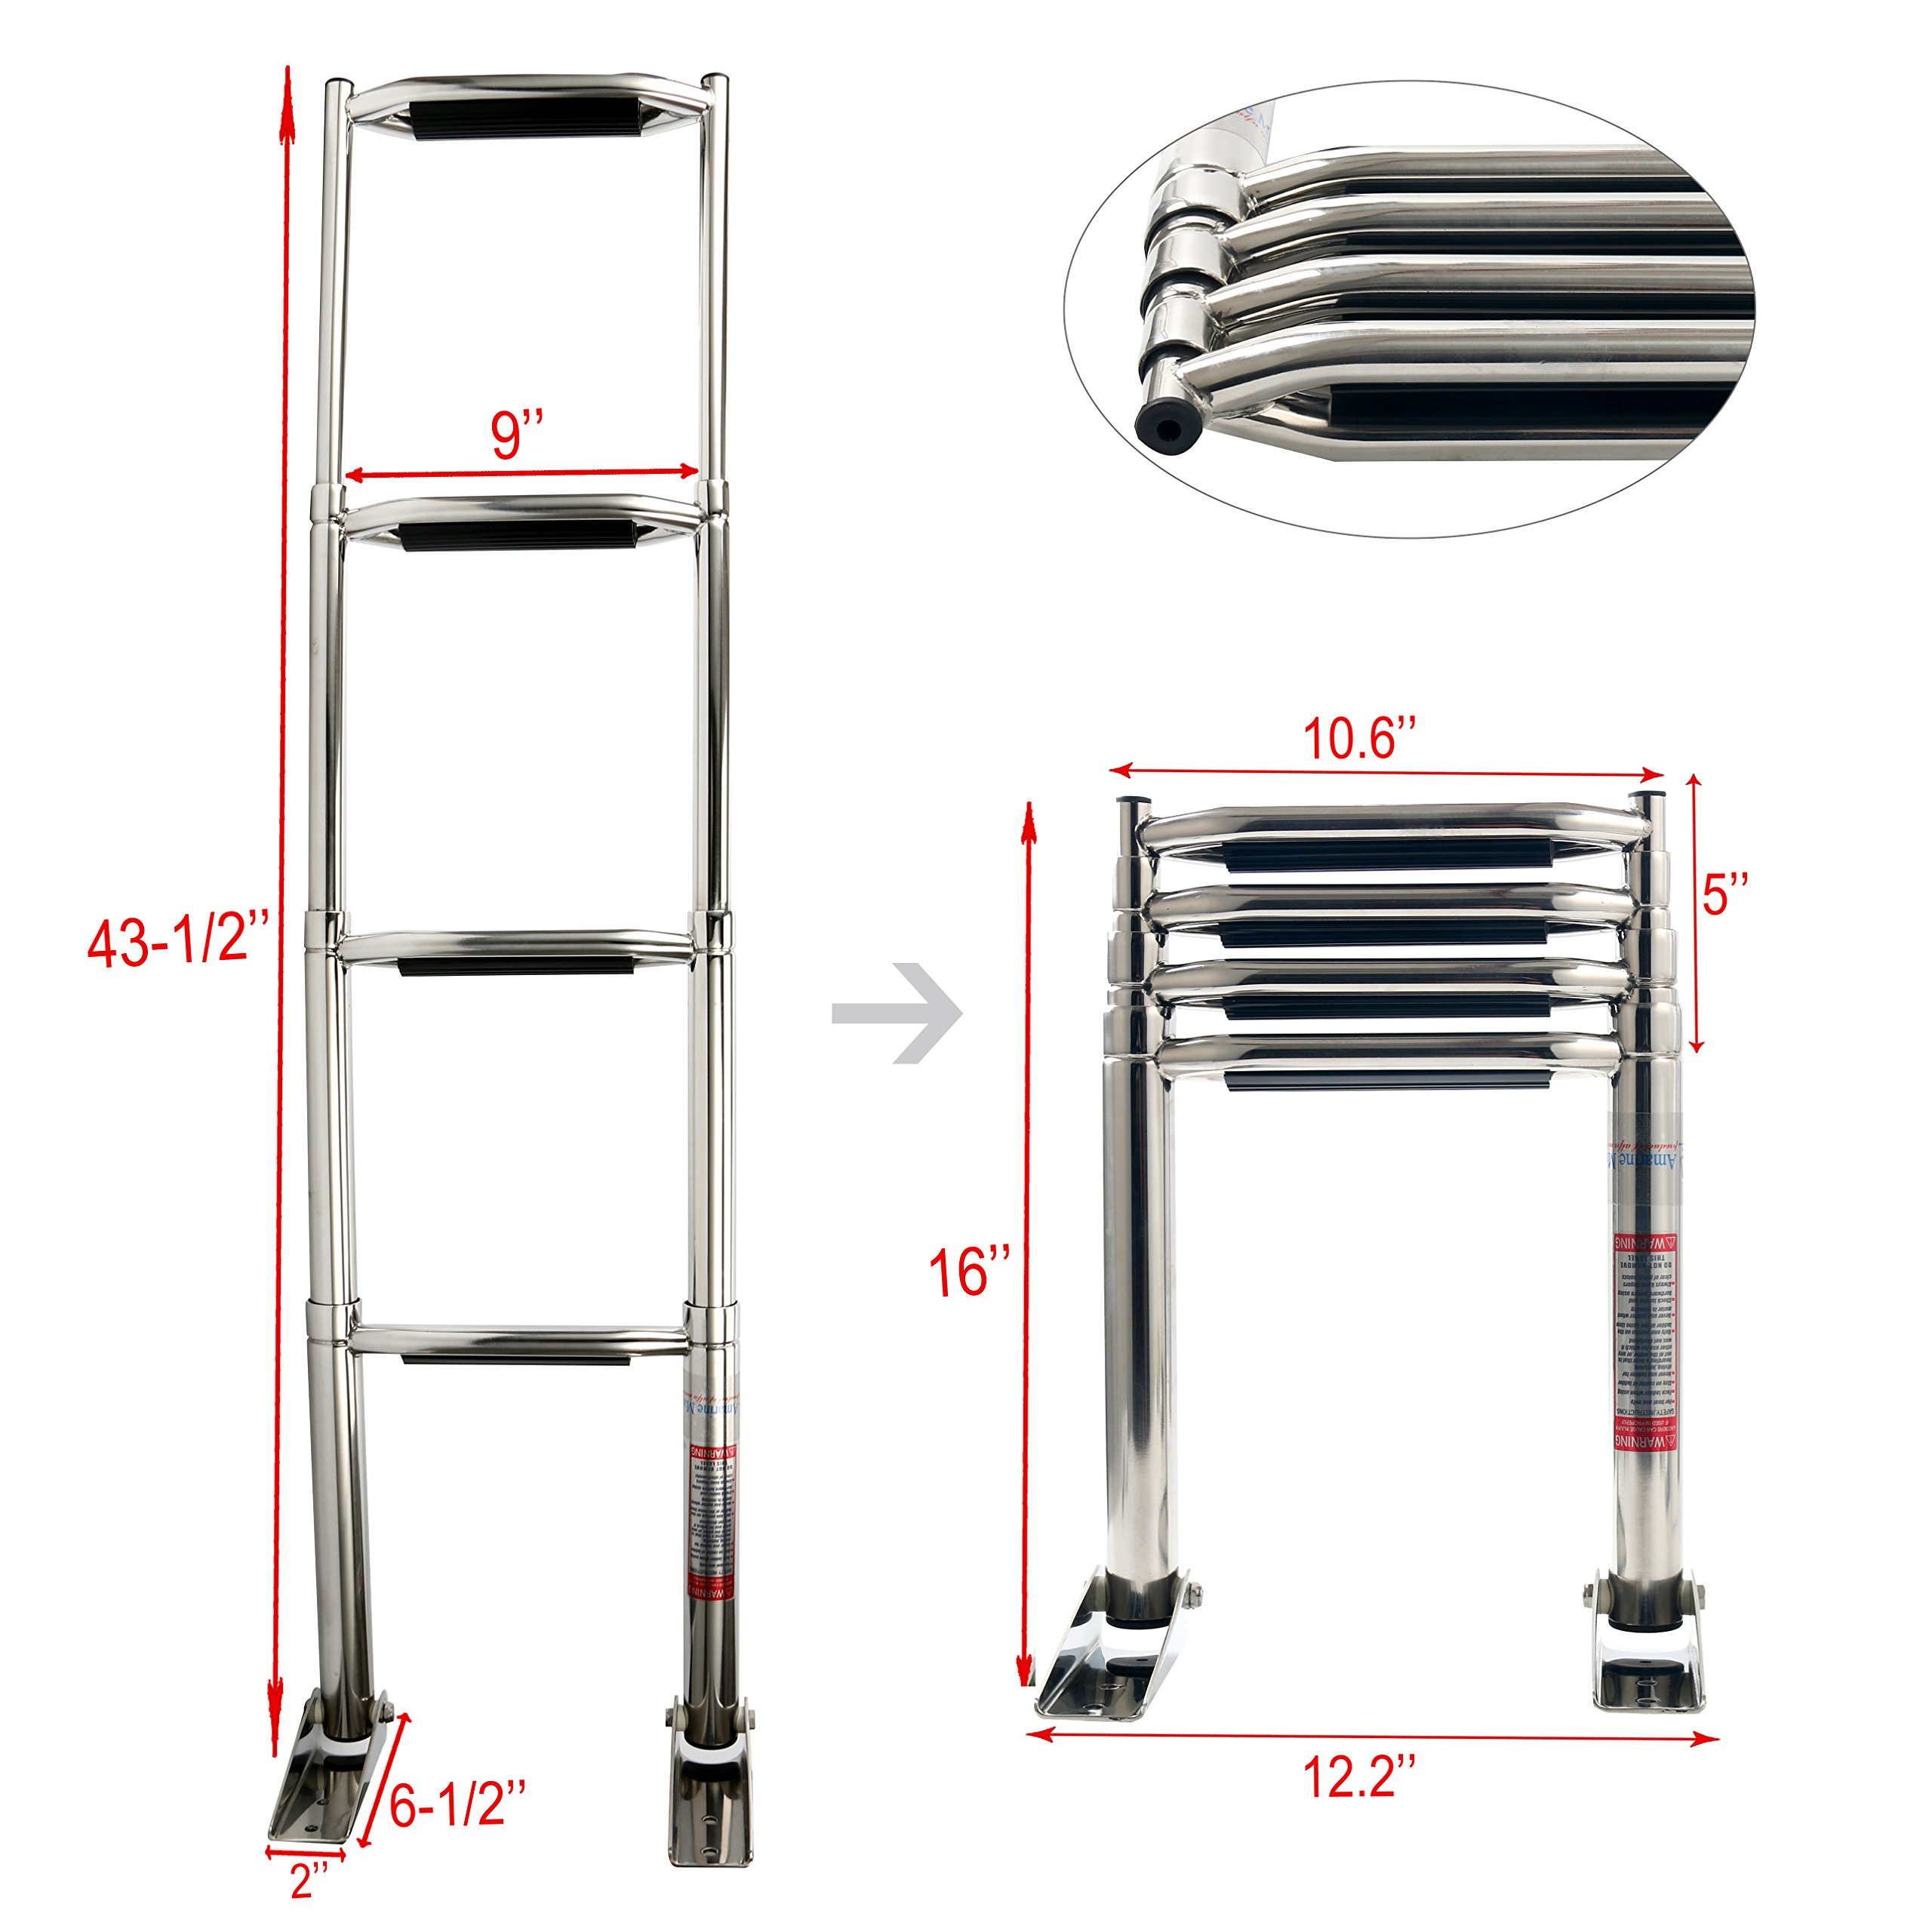 Amarine-made 4 Step Wide Steps Stainless Steel Telescoping Boat Ladder Swim Step